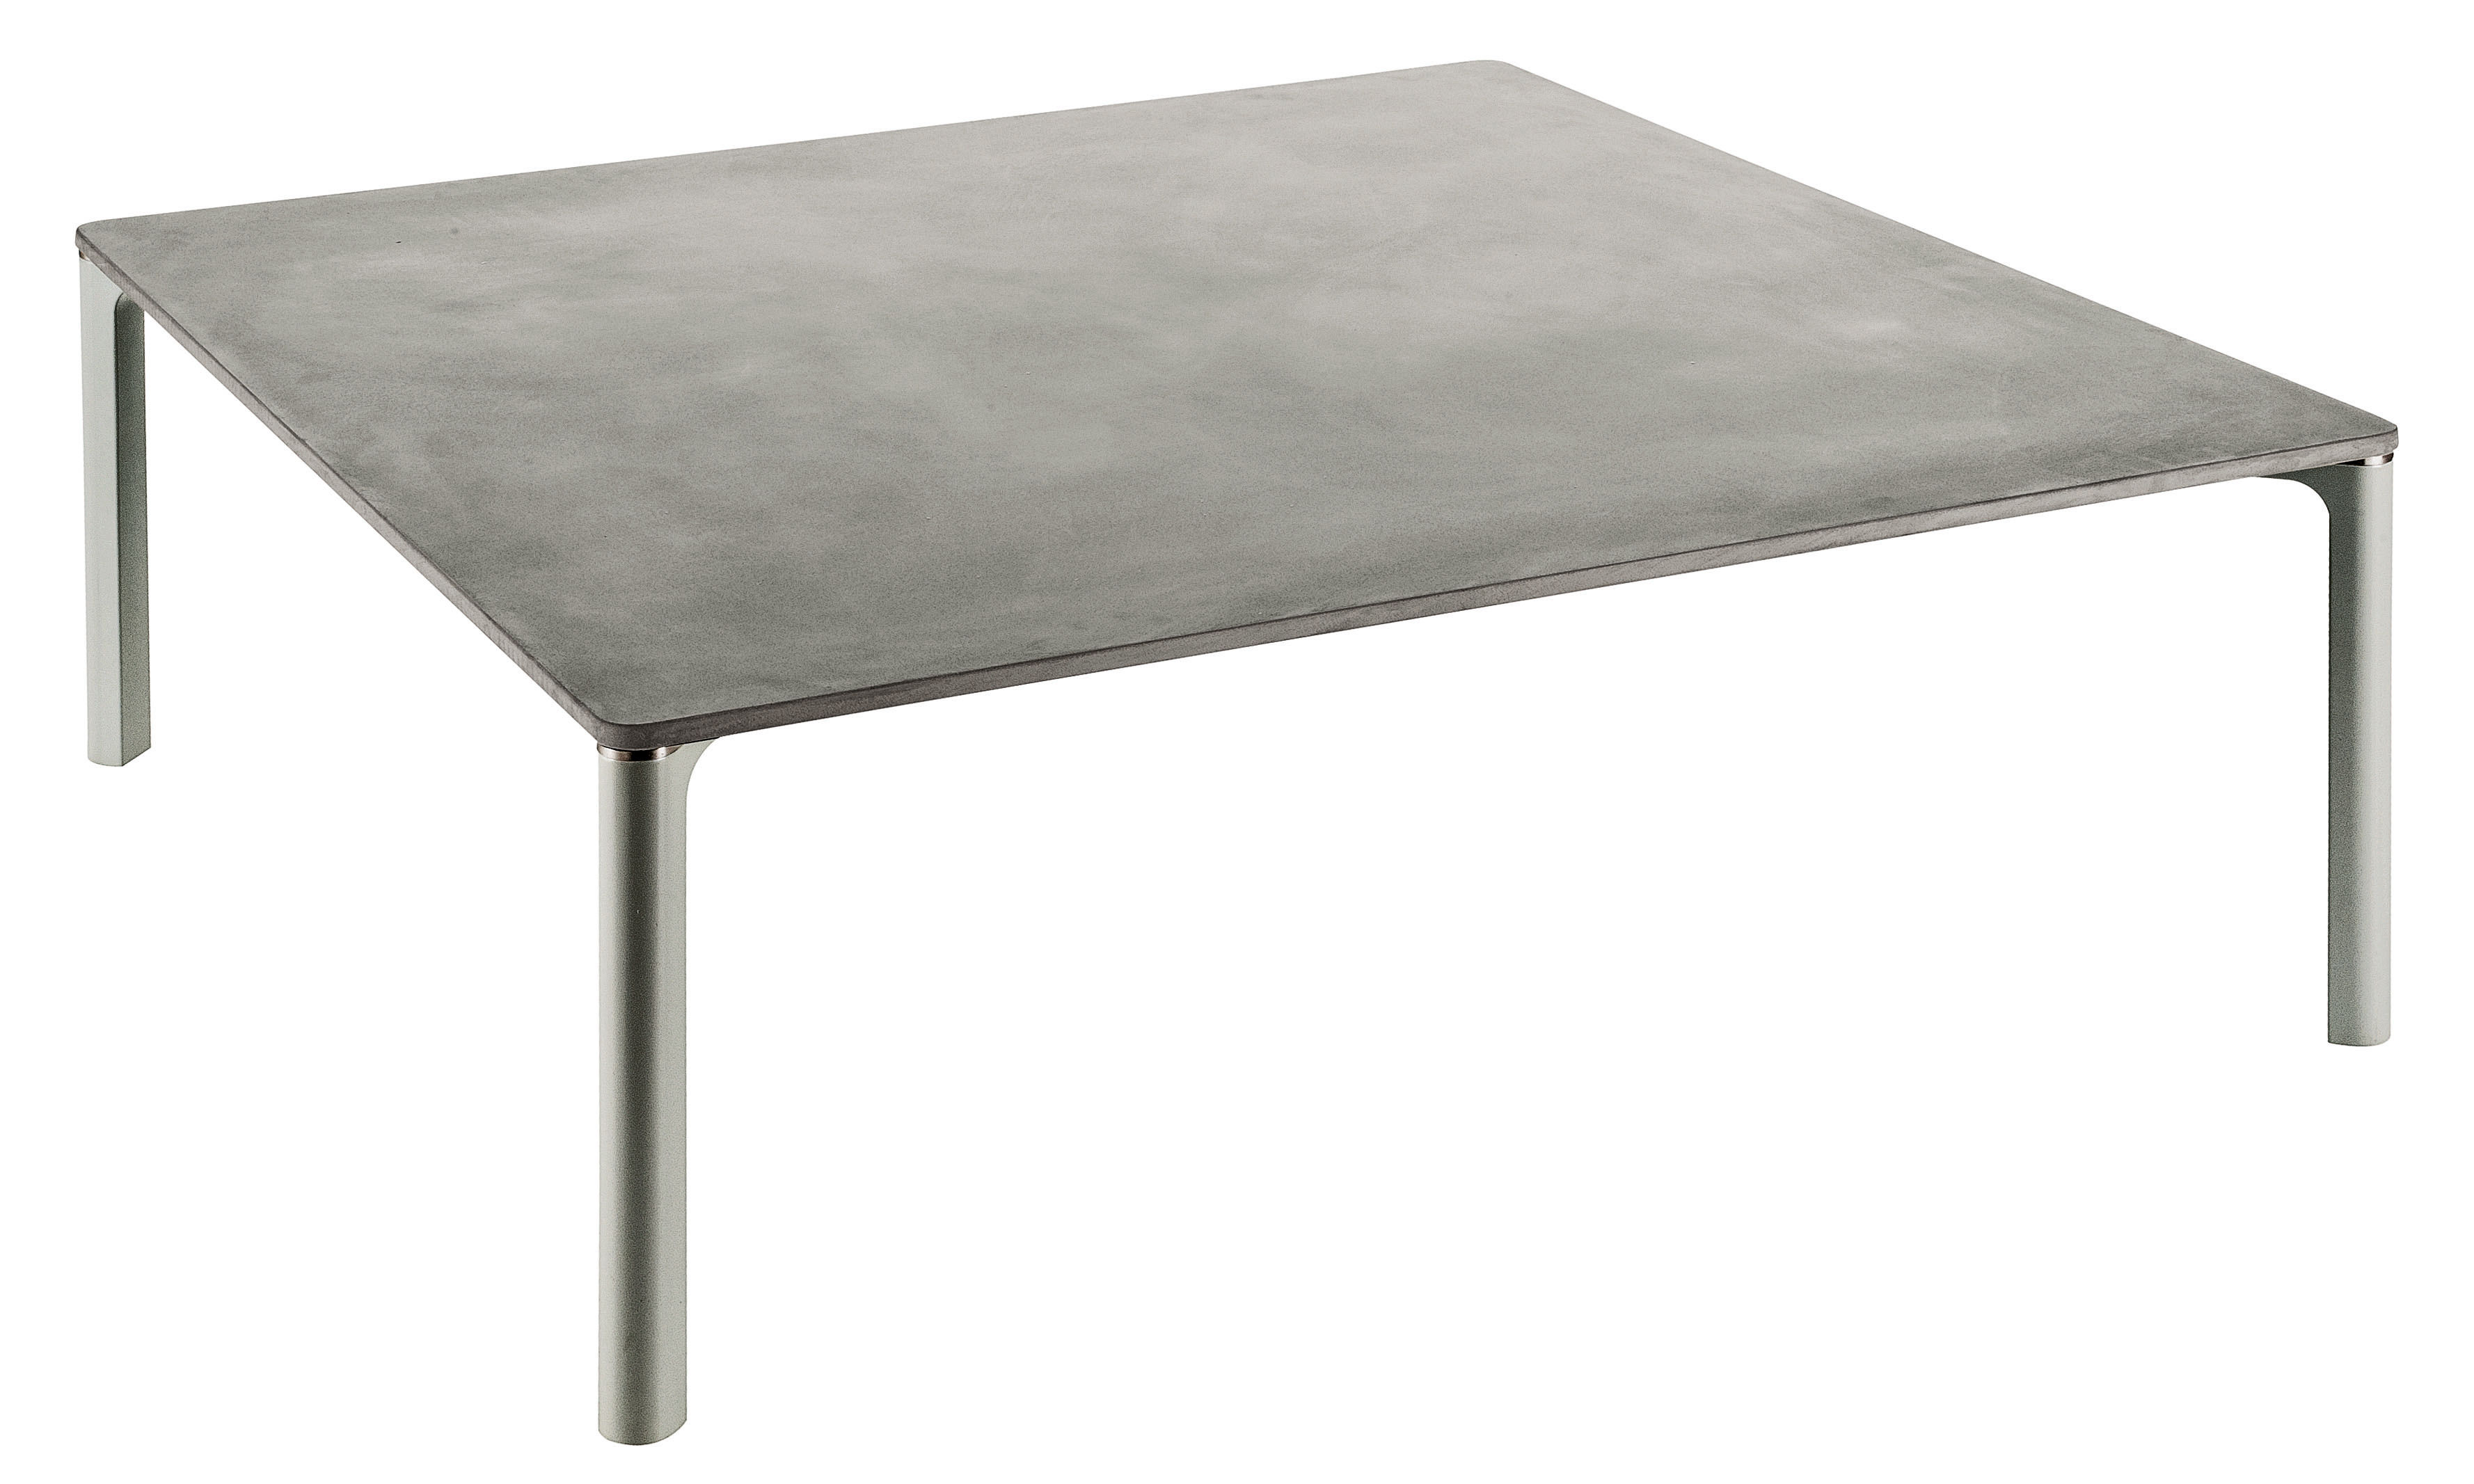 Table basse spillino 110 x 110 cm ciment pieds gris for Couchtisch 110x110